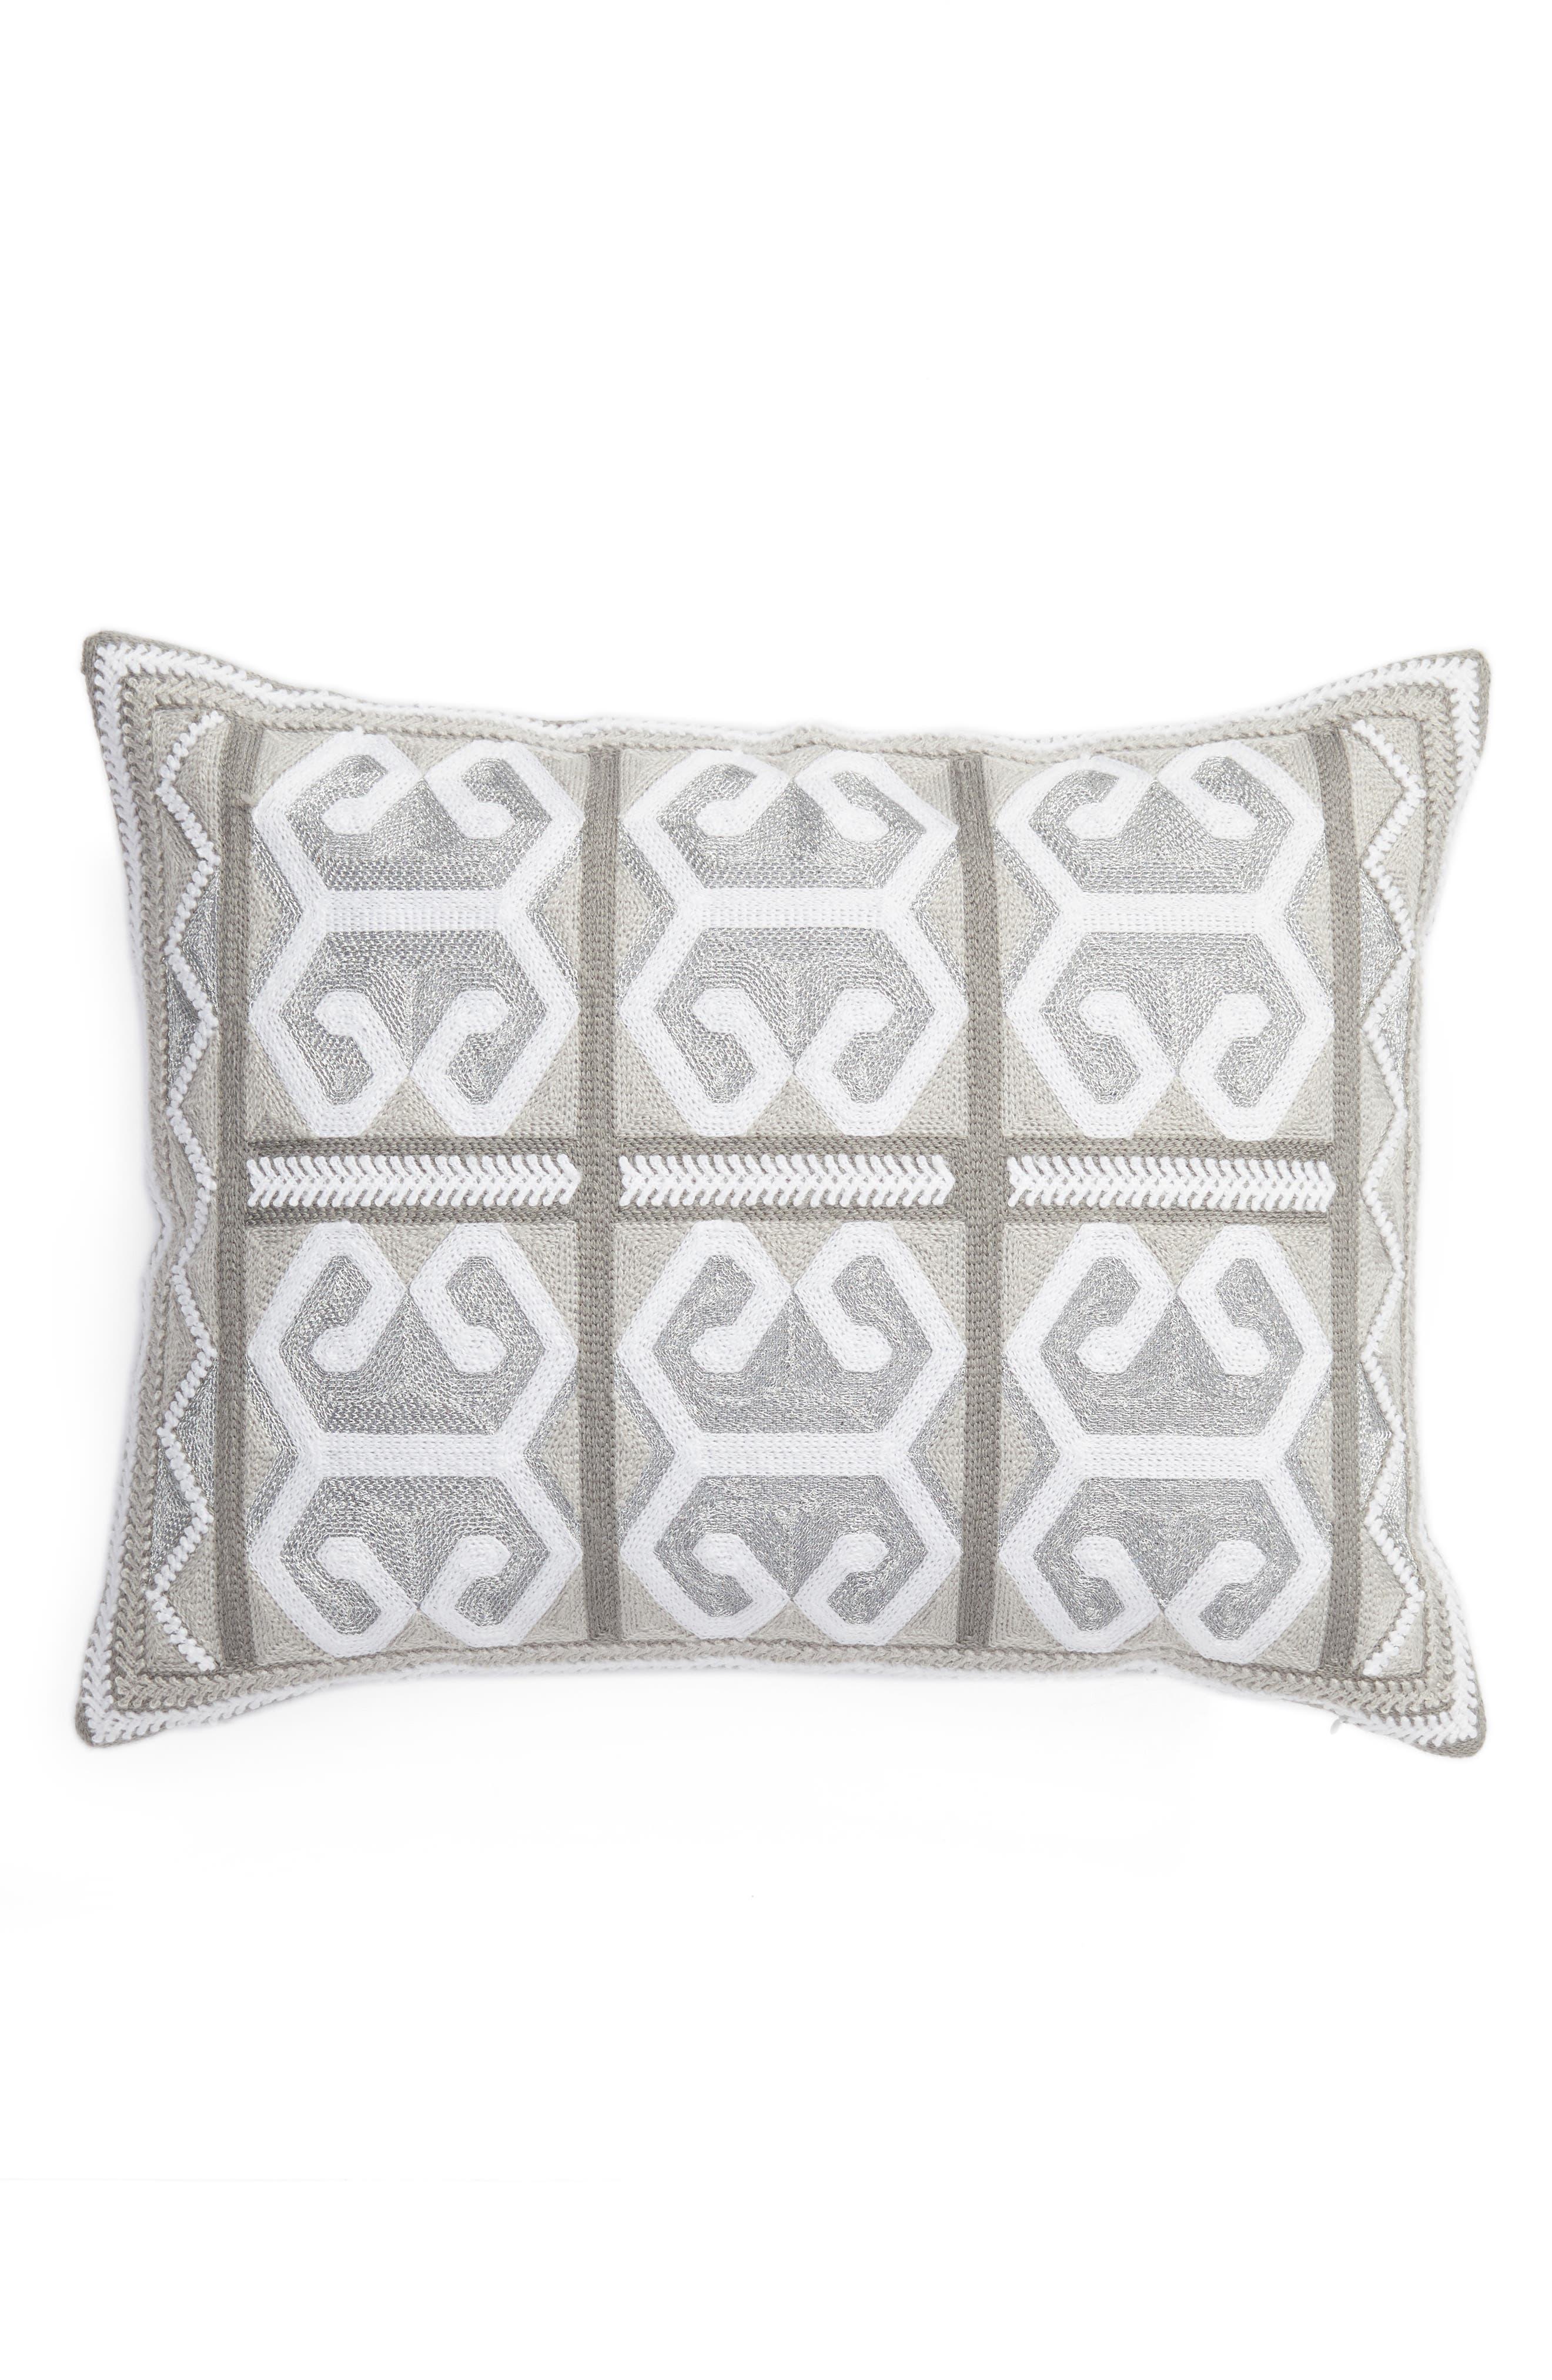 Caleb Crewel Stitch Accent Pillow,                         Main,                         color, Silver